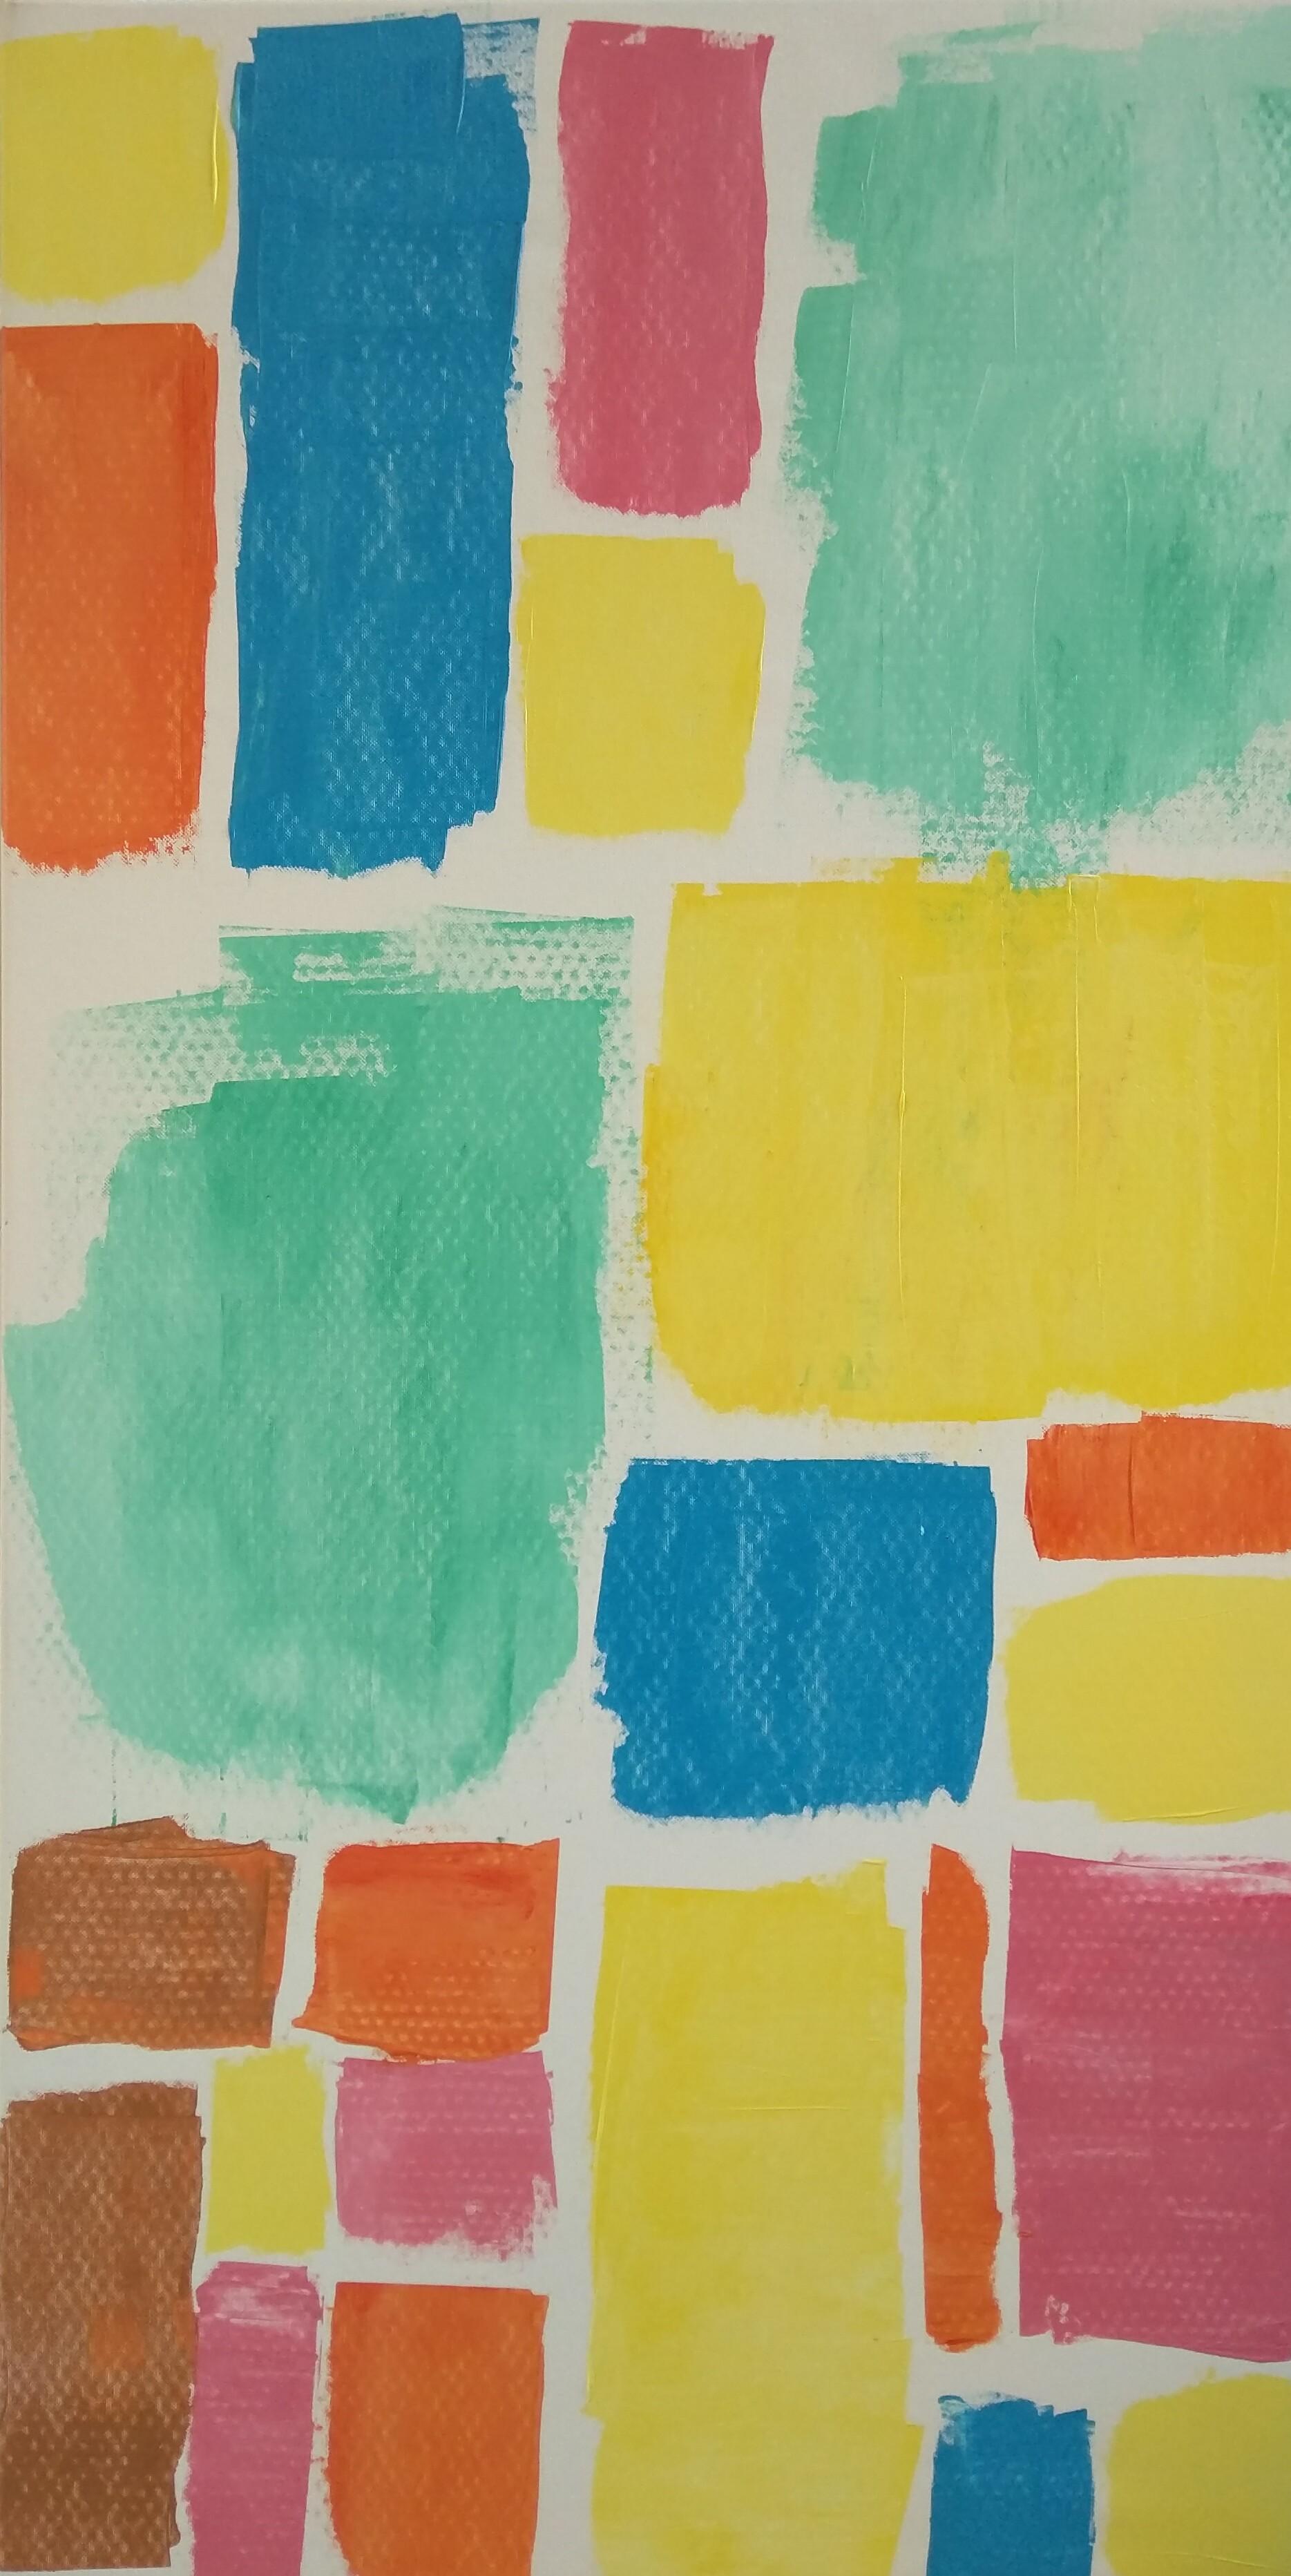 Série rectangles irréguliers